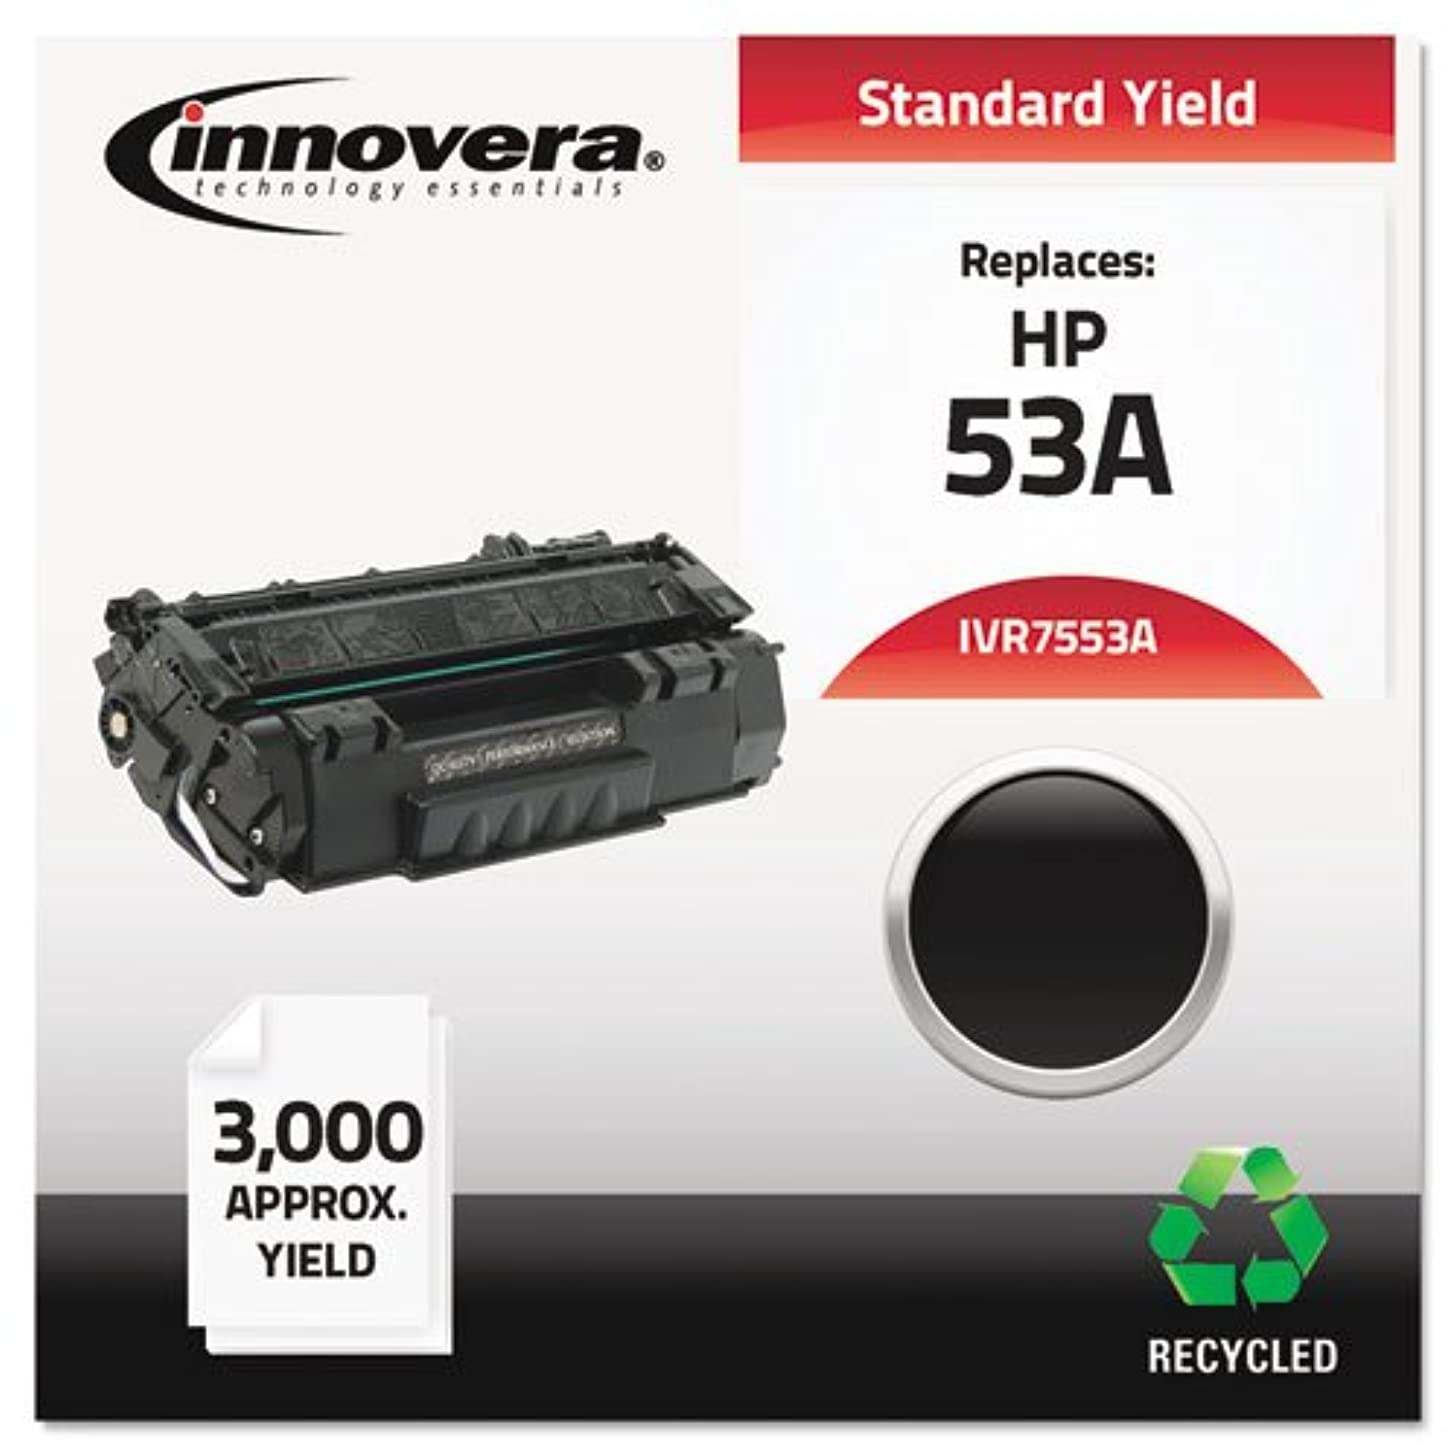 IVR7553A - Remanufactured Q7553A 53A Laser Toner